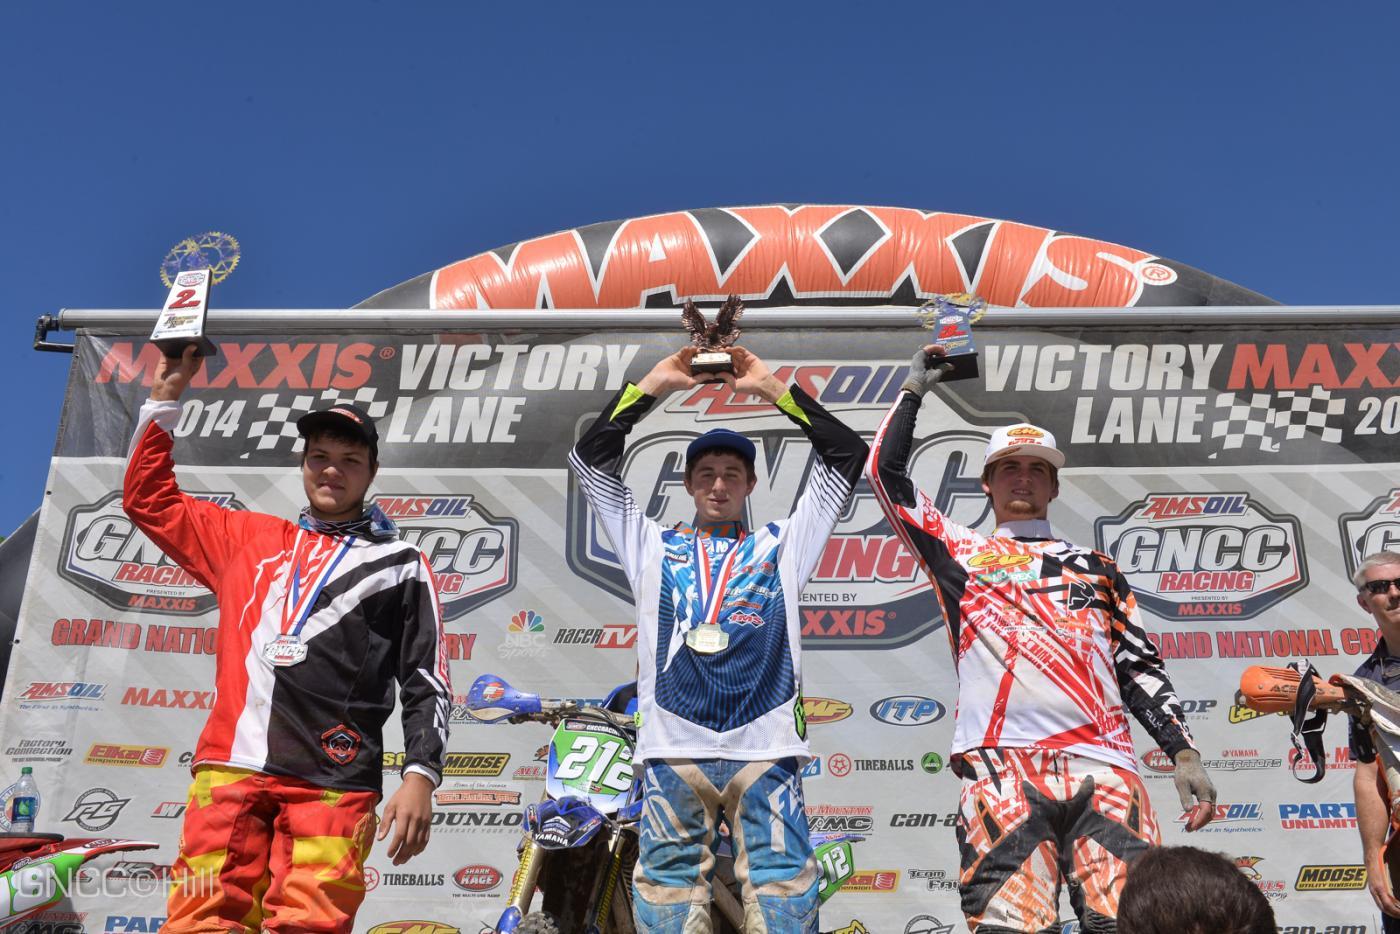 XC2 Podium: (left) Trevor Bollinger, Ricky Russell, (right) Grant Baylor Photo: Hill